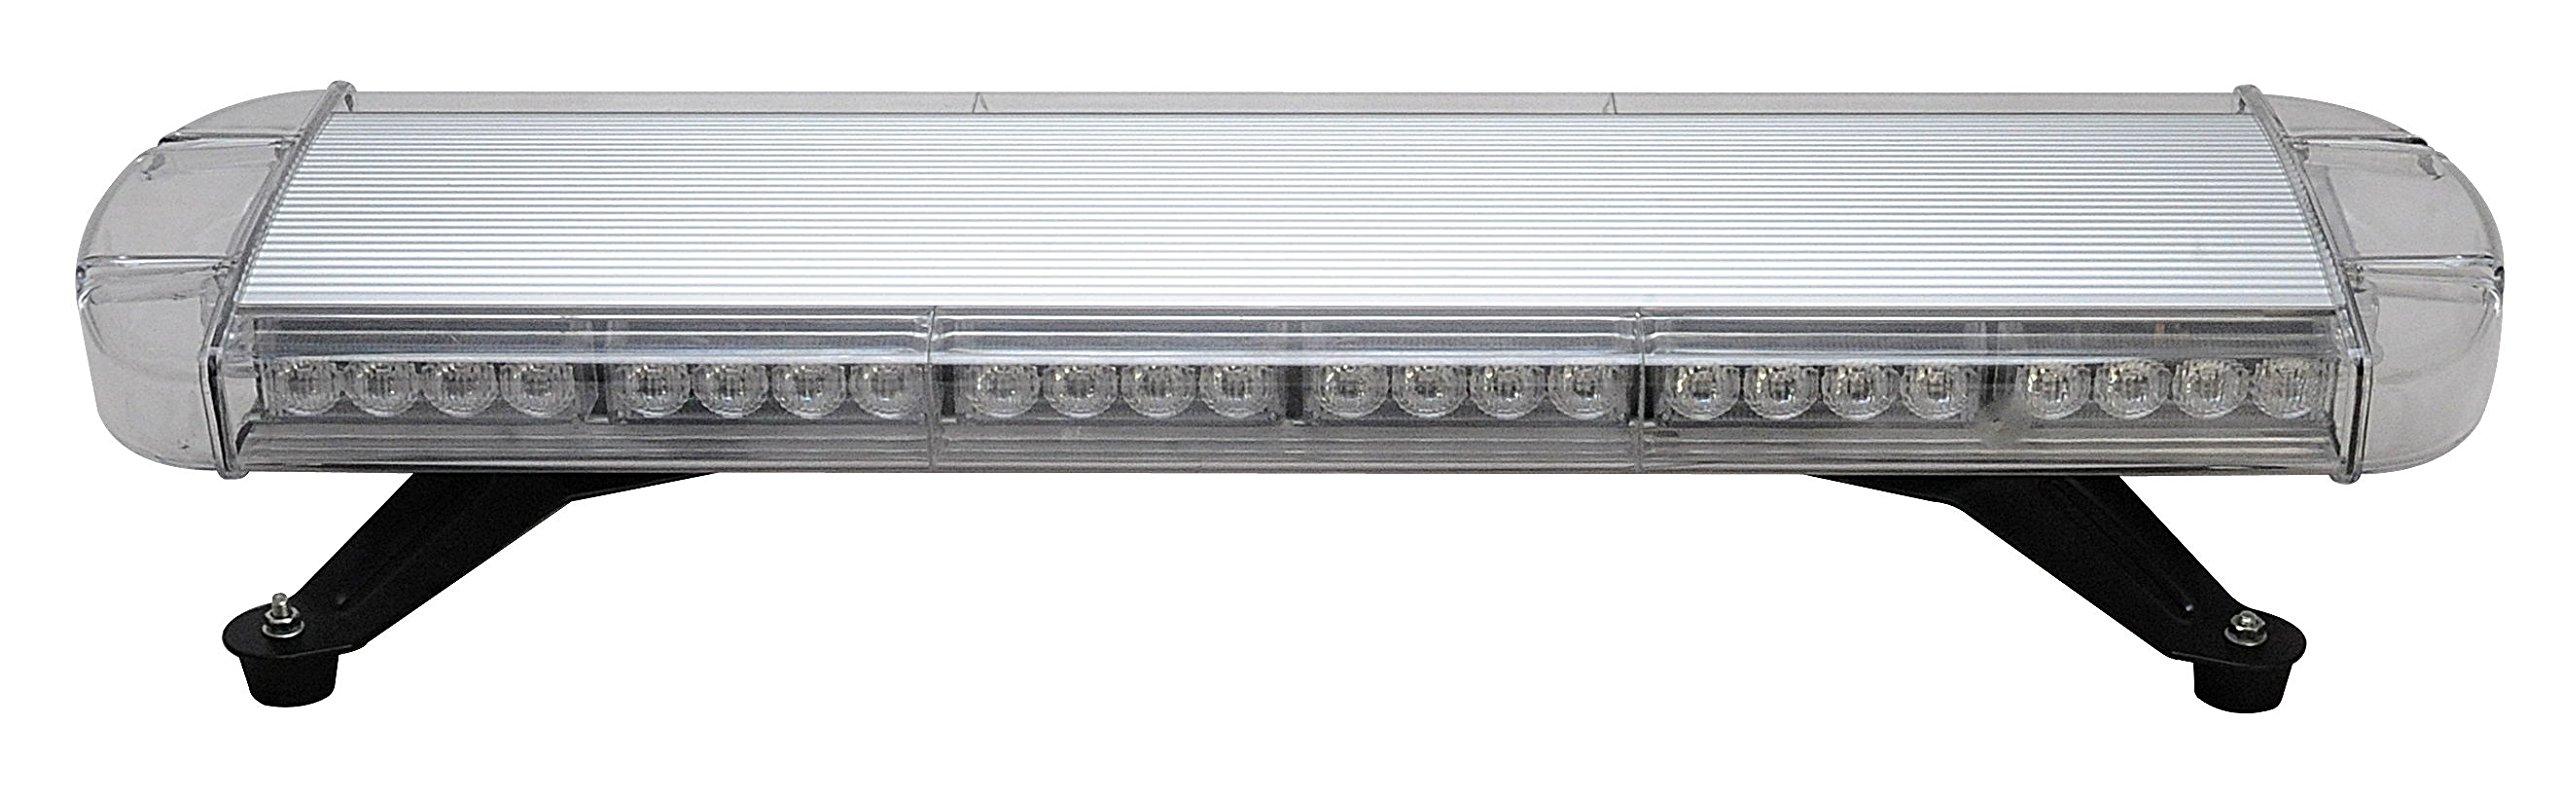 BiaoChi Car Auto High Power LED CREE 6 Flash Modes 12V 56W Truck Boat Law Enforcement Hazard Security Emergency Warning Flashlight Roof Top Strobe Light Lamp Bar (Blue) by BiaoChi® (Image #1)